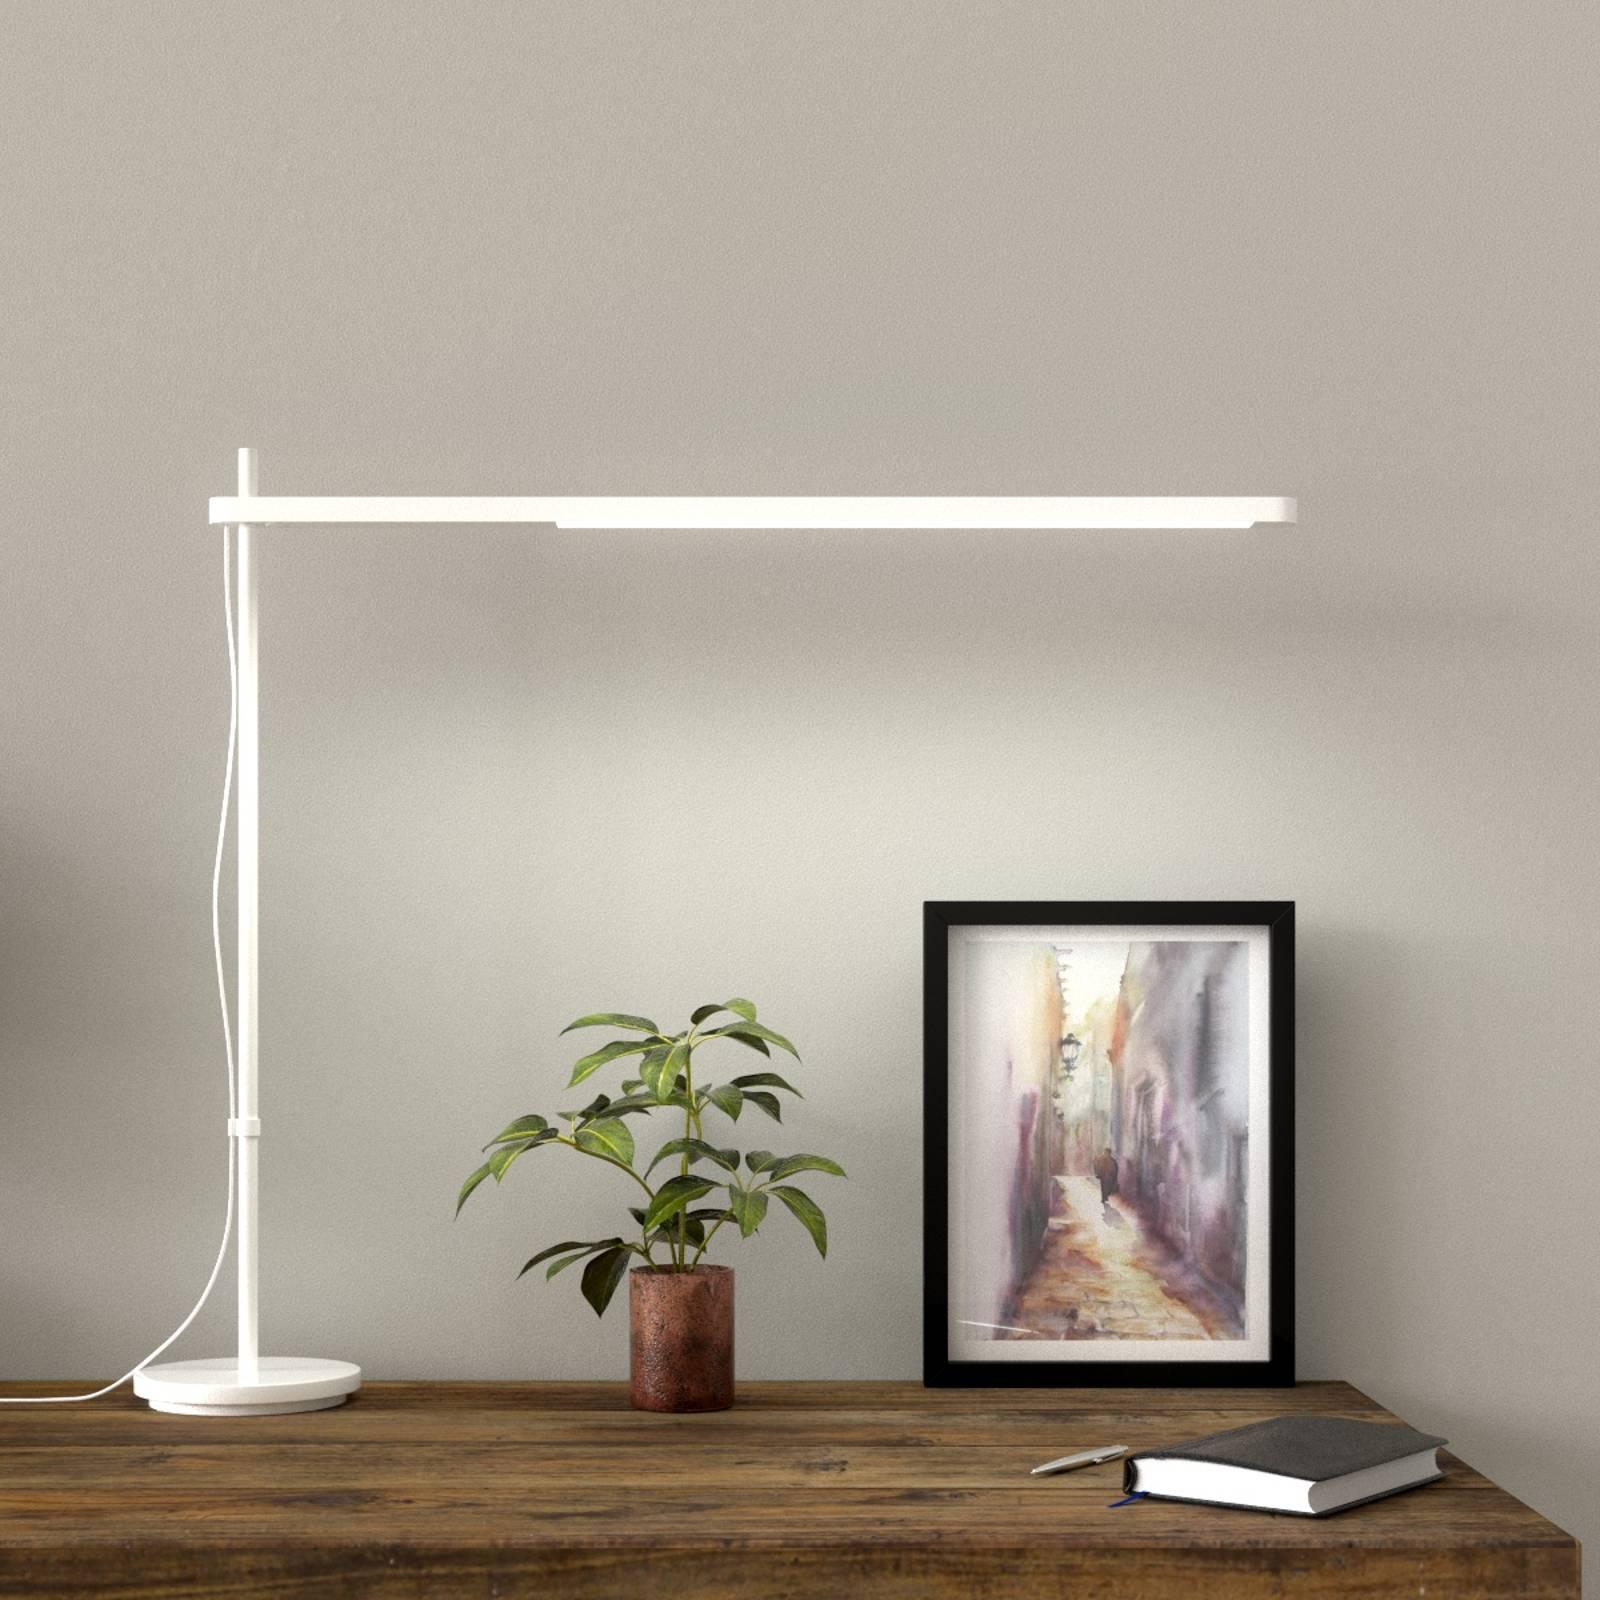 Lampada LED da tavolo Talak Professional, bianca